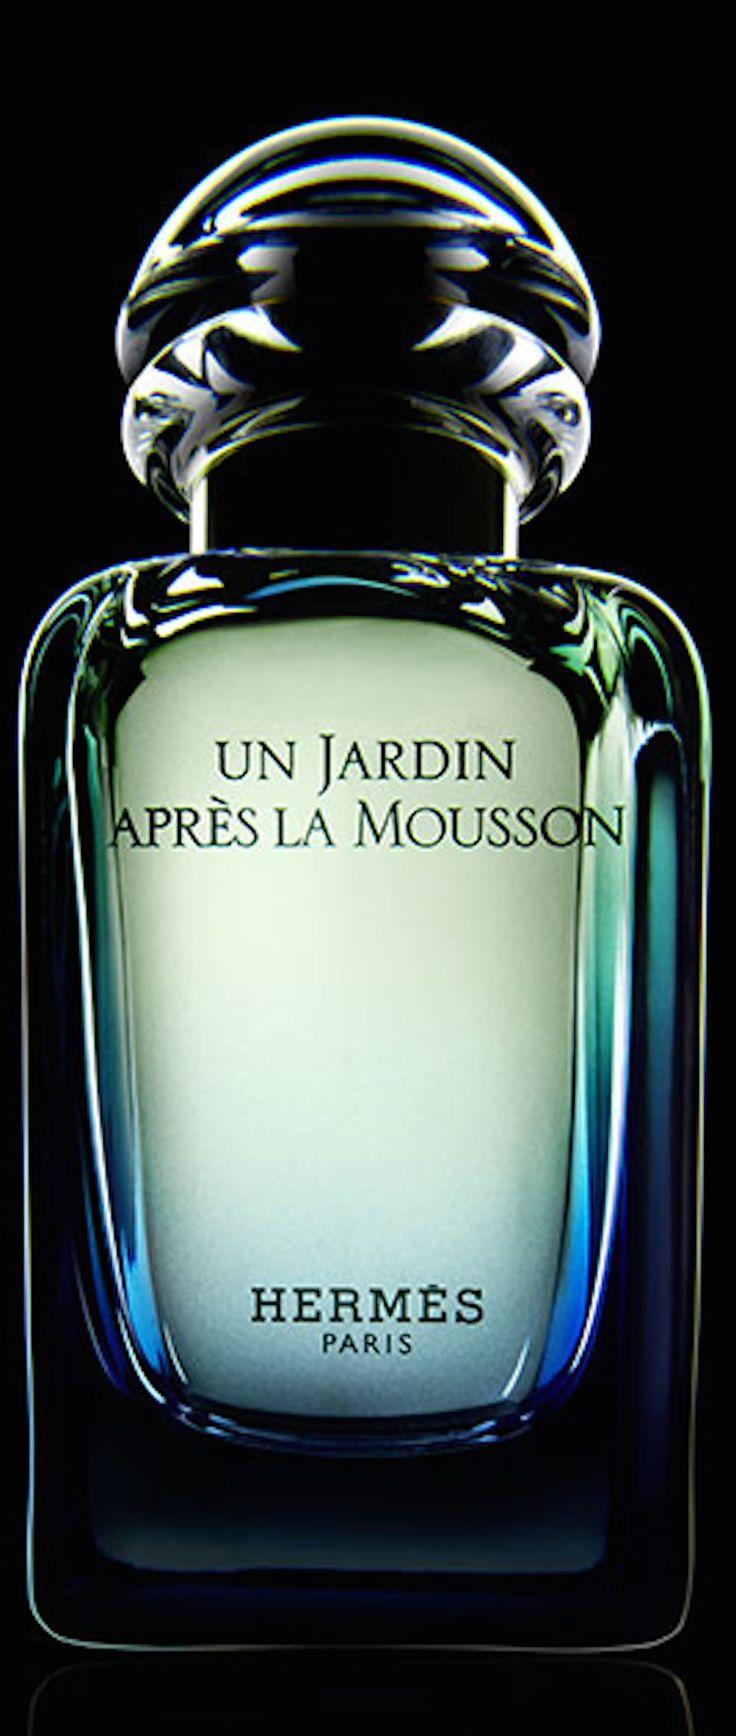 Un Jardin Après La Mousson by Hermes. Coriander, ginger, pepper, ginger flower, cardamom.